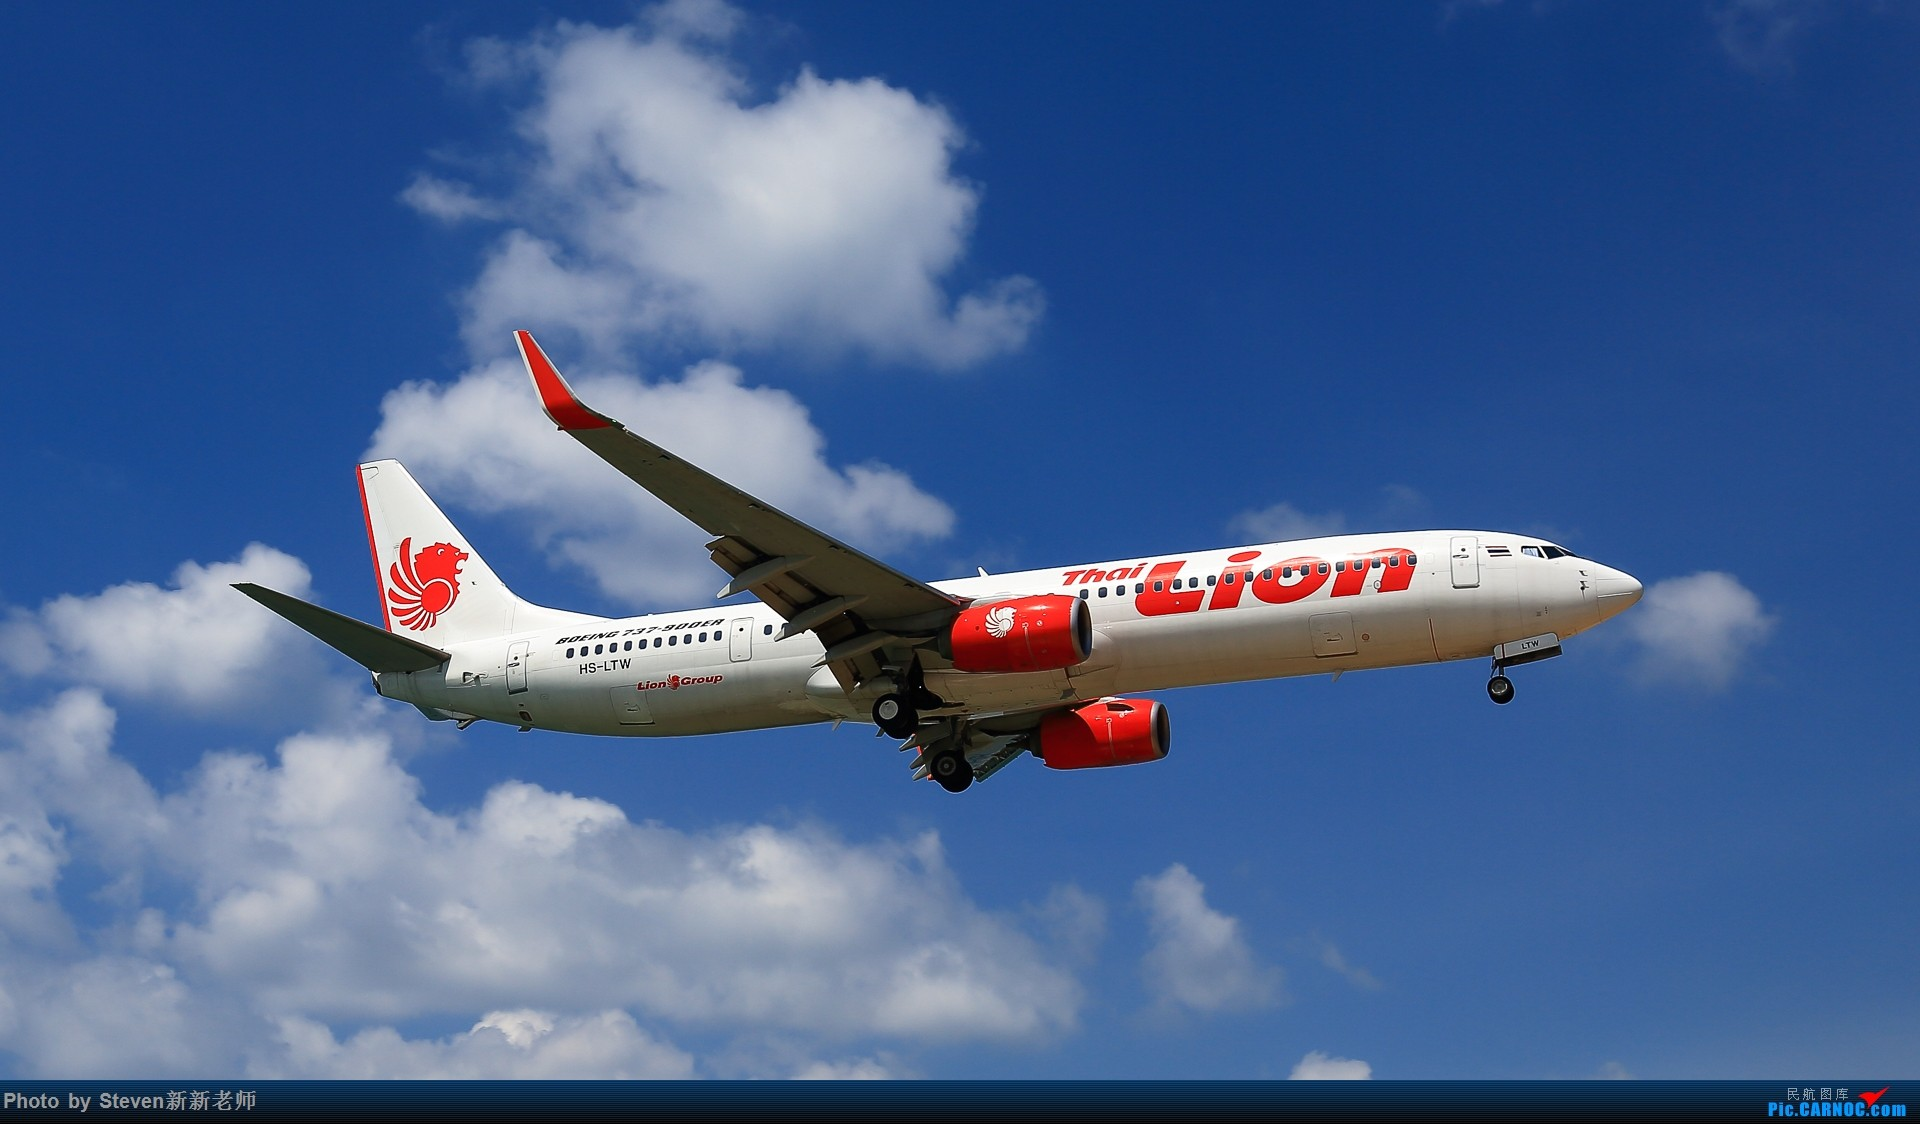 "Re:[原创]亚洲""圣马丁岛""—普吉国际机场拍机 BOEING 737-900ER HS-LTW 泰国普吉机场"